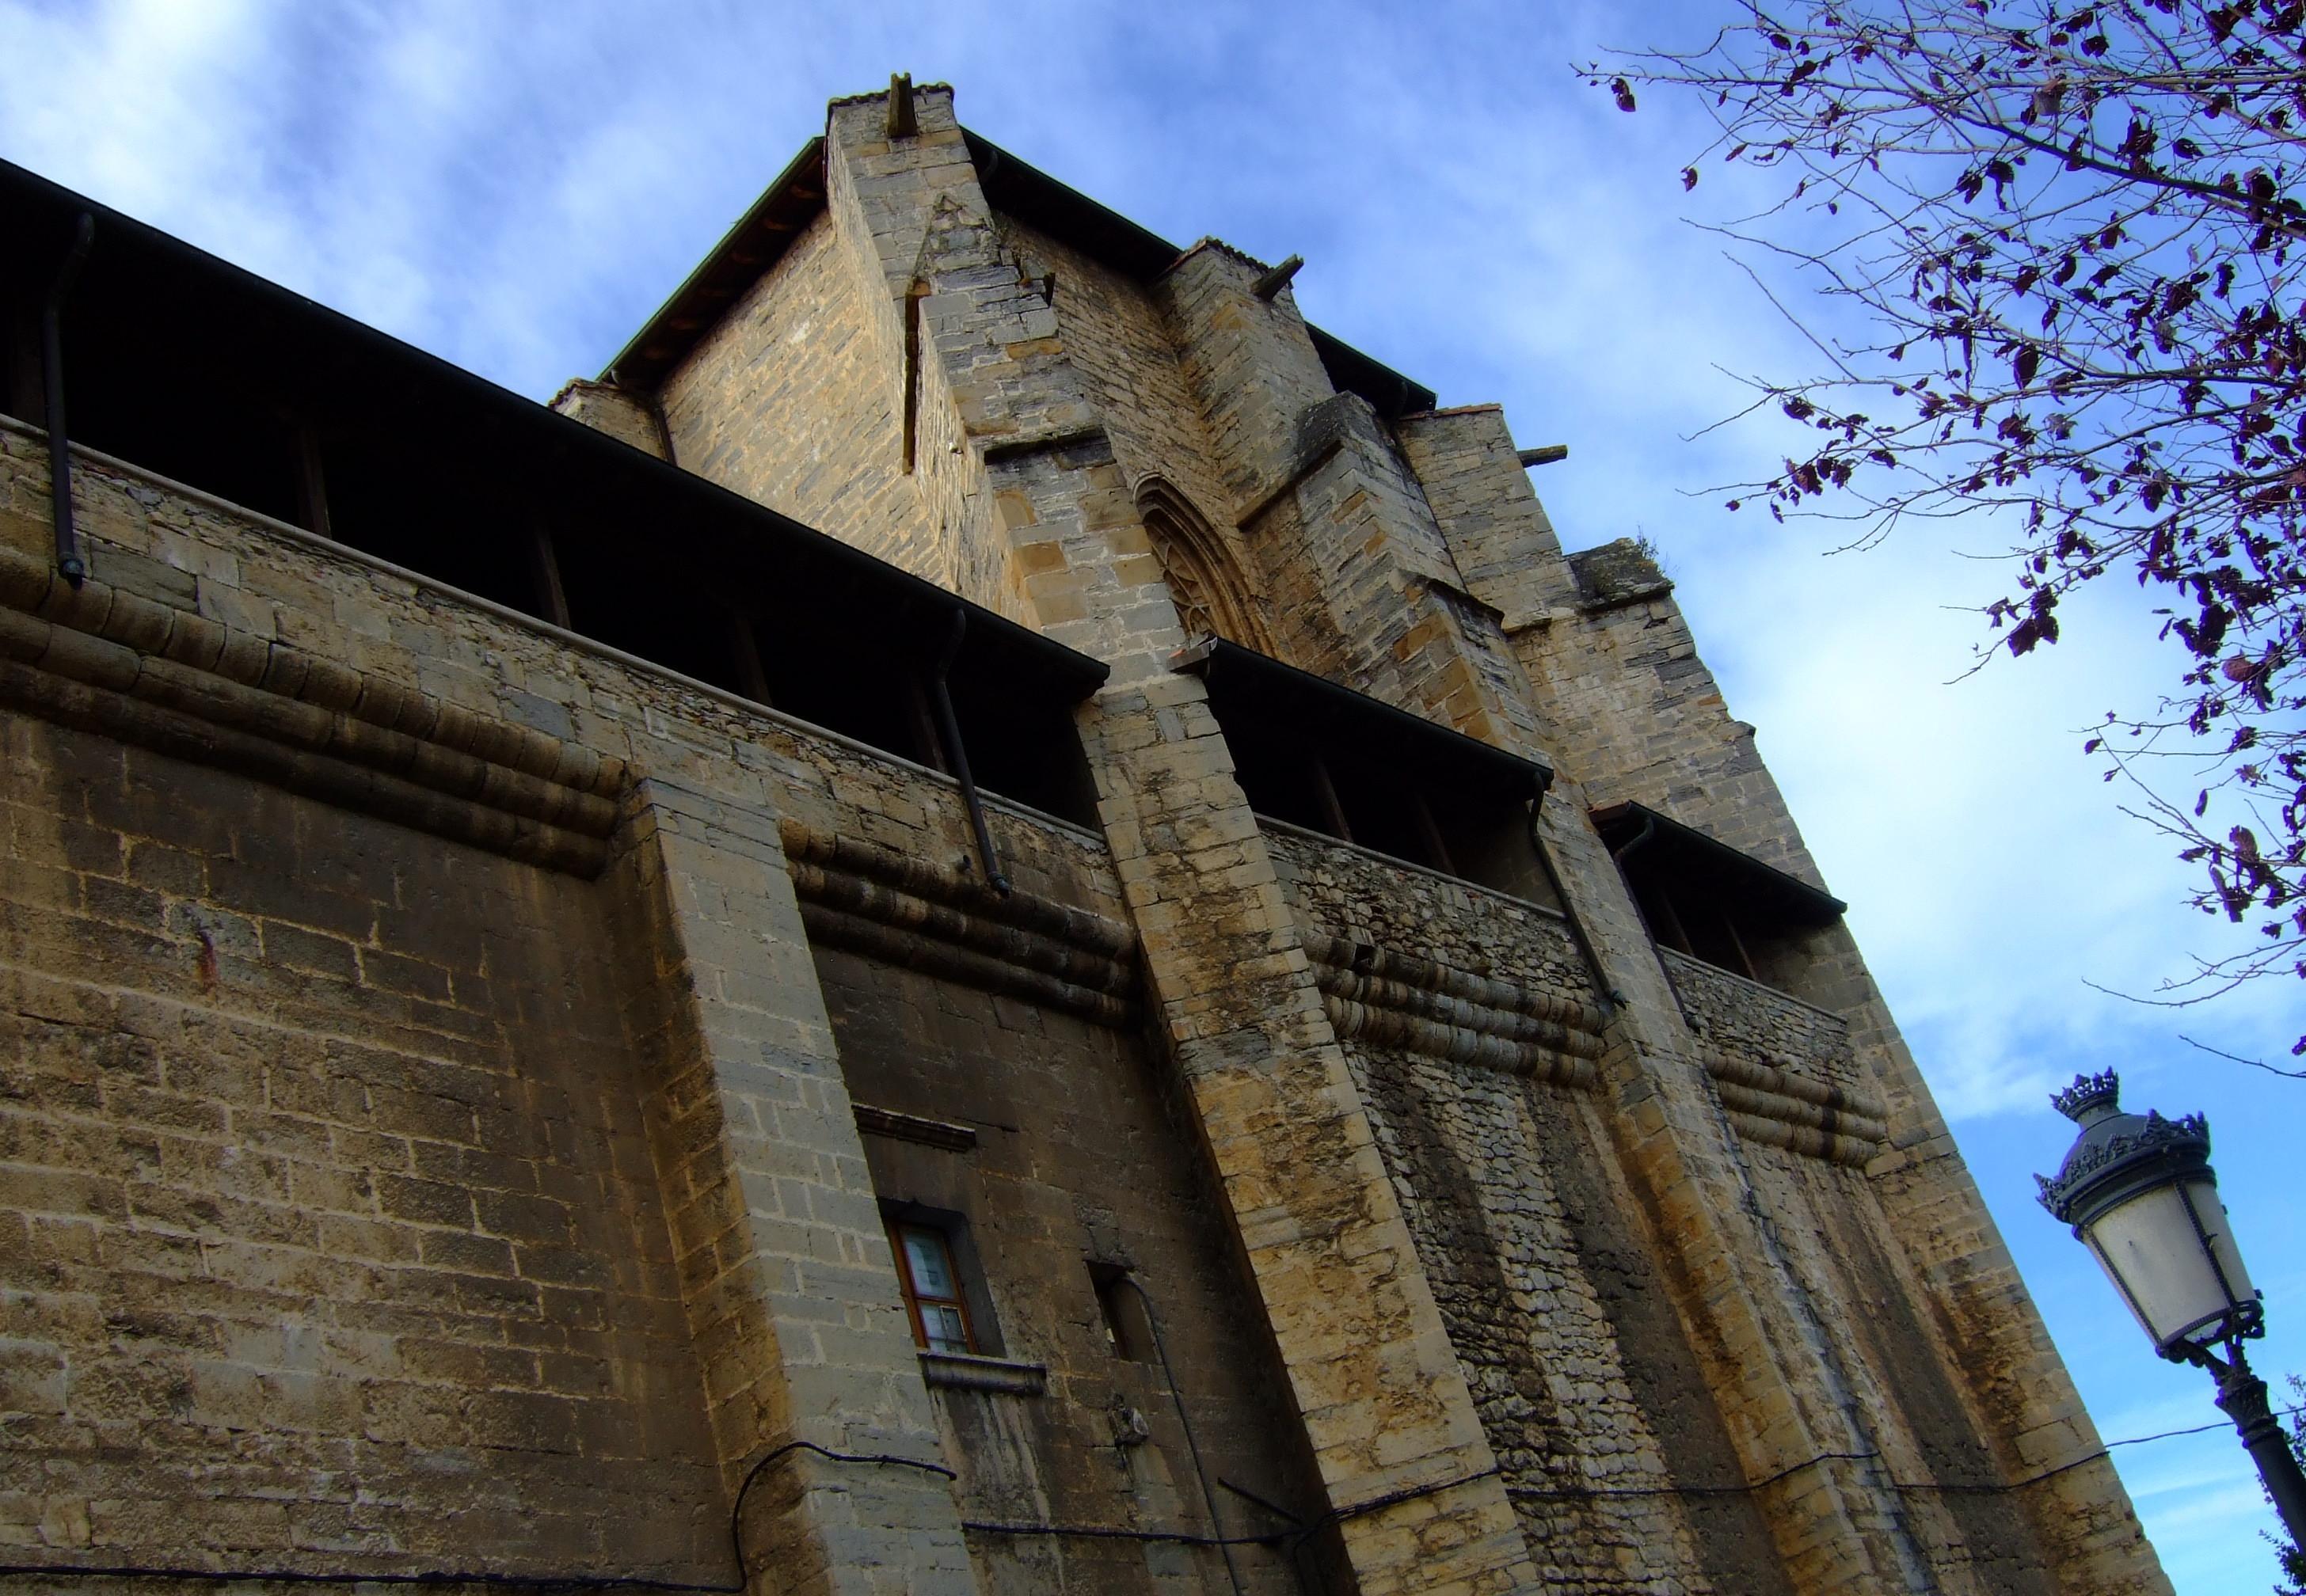 Impresionante lateral de la iglesia-fortaleza de Sta. María.